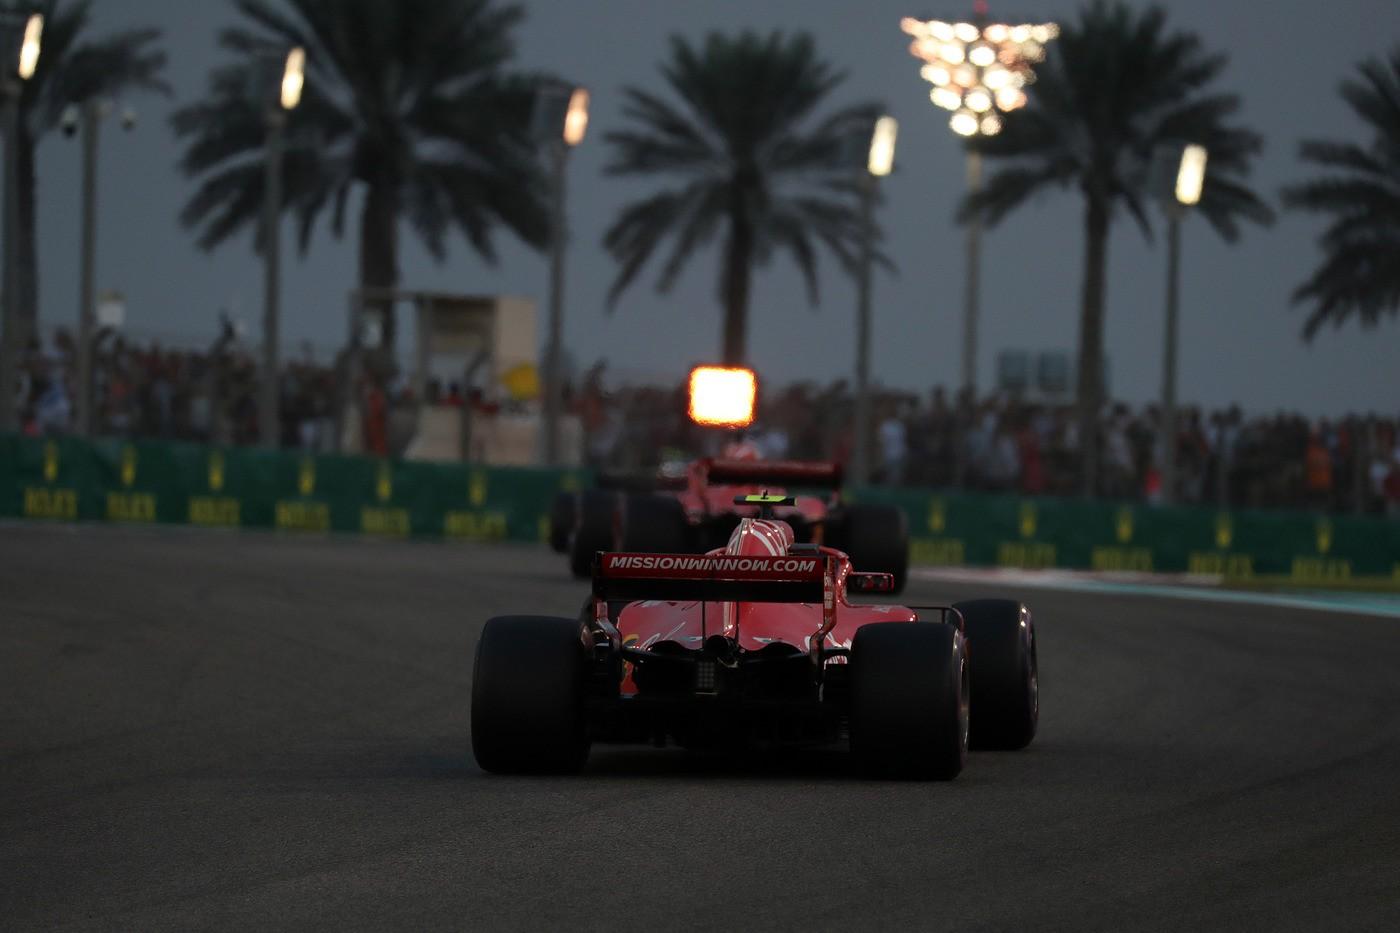 © Photo4 / LaPresse 25/11/2018 Abu Dhabi, UAE Sport Grand Prix Formula One Abu Dhabi 2018 In the pic: Kimi Raikkonen (FIN) Scuderia Ferrari SF71H and Sebastian Vettel (GER) Scuderia Ferrari SF71H